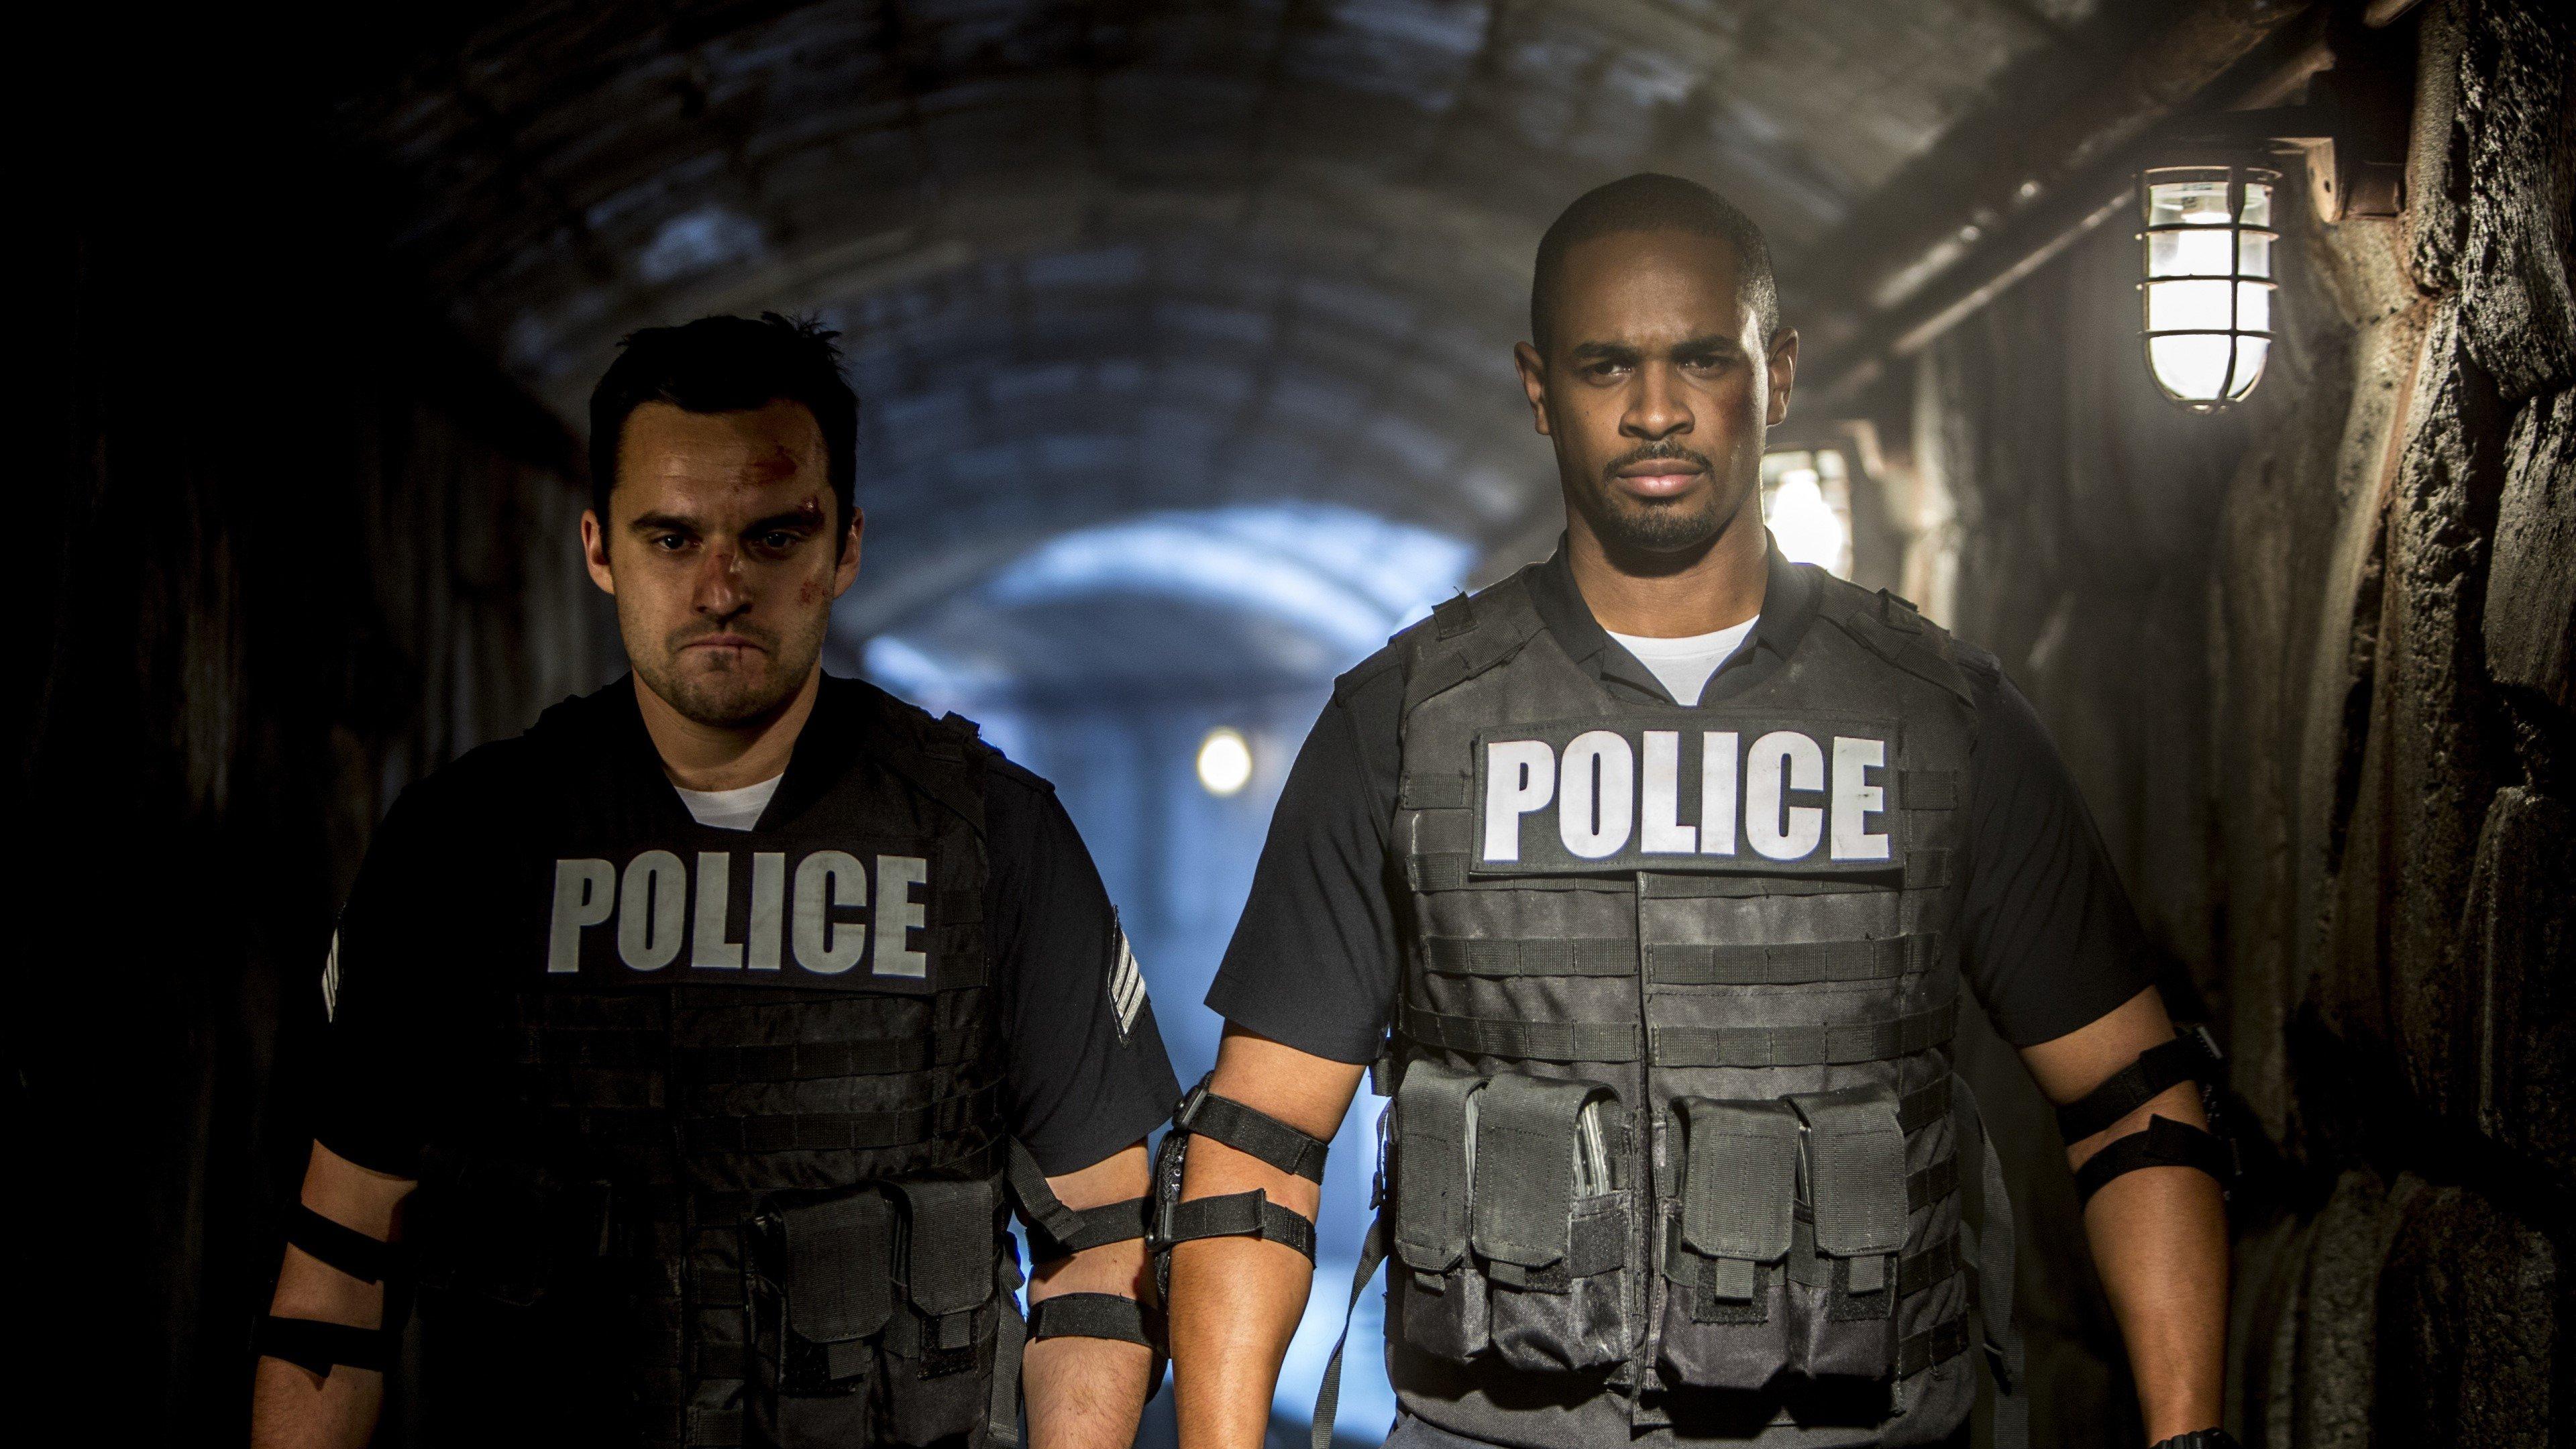 Fondos de pantalla Damon Wayans Jr y Jake Johnson en Vamos de Polis